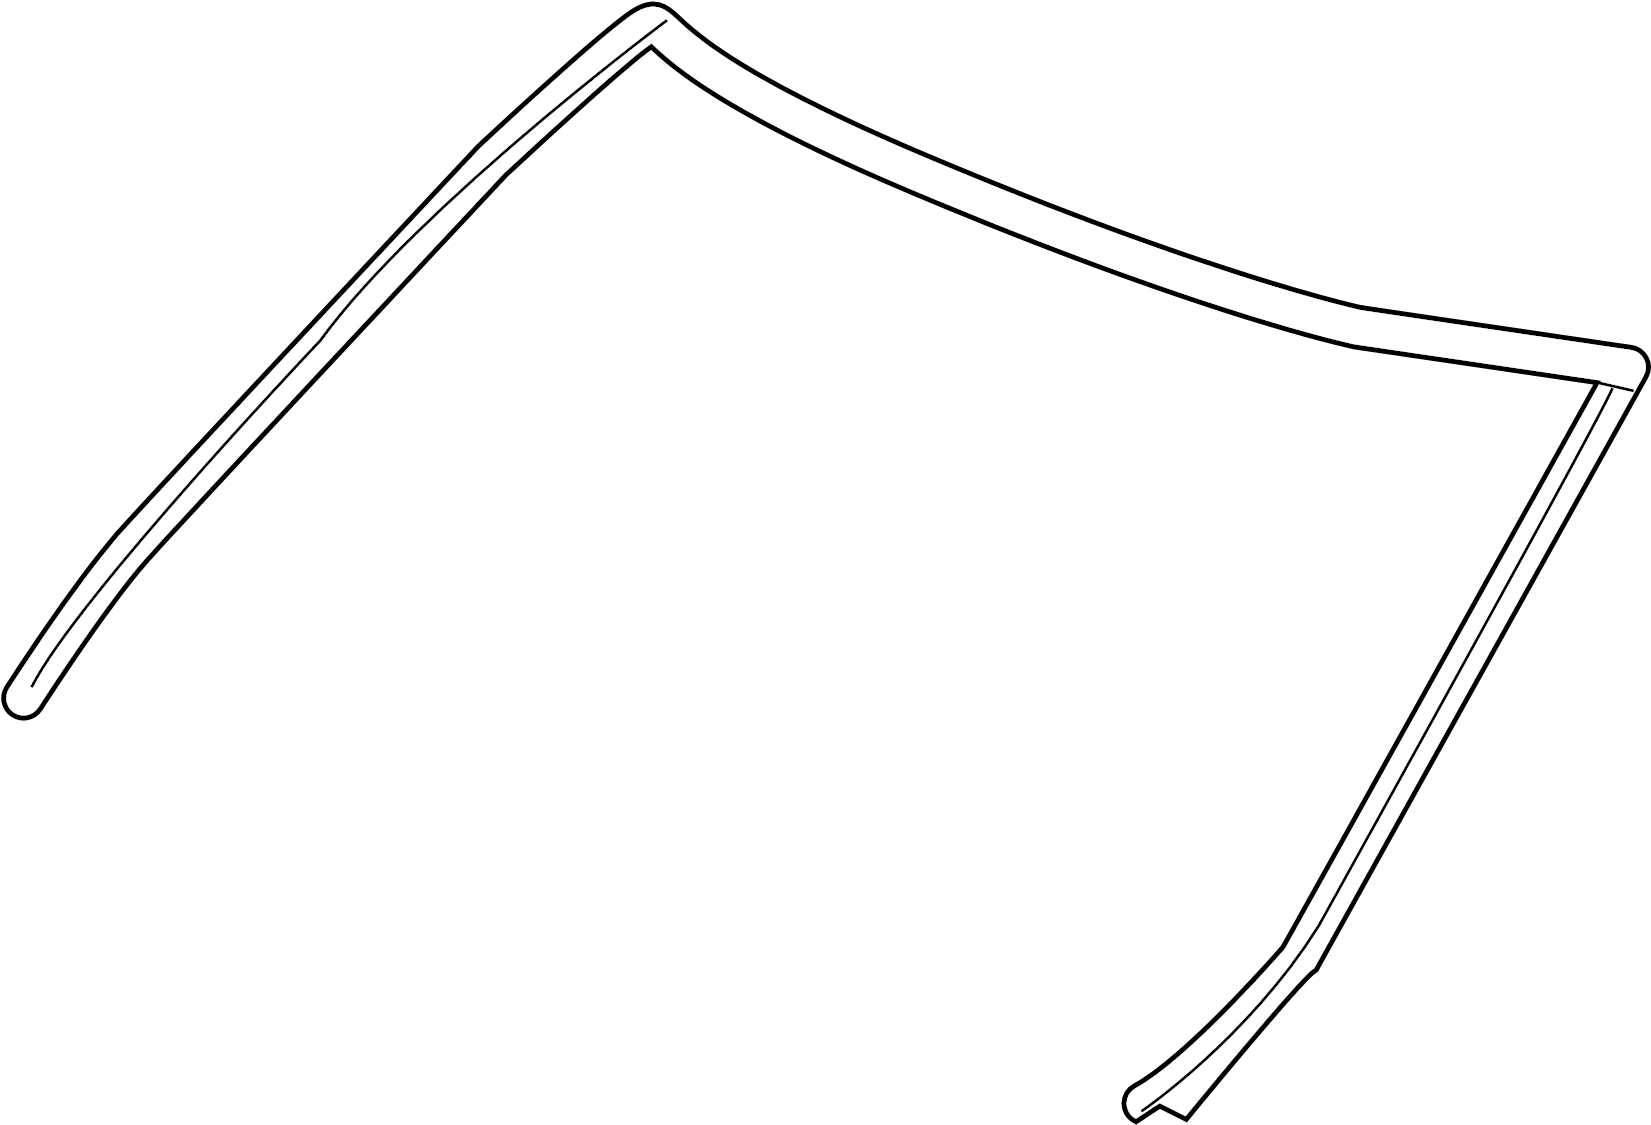 hight resolution of fuse diagram for 2005 buick terraza imageresizertool com 2006 buick lacrosse belt routing 2000 buick park avenue serpentine belt diagram